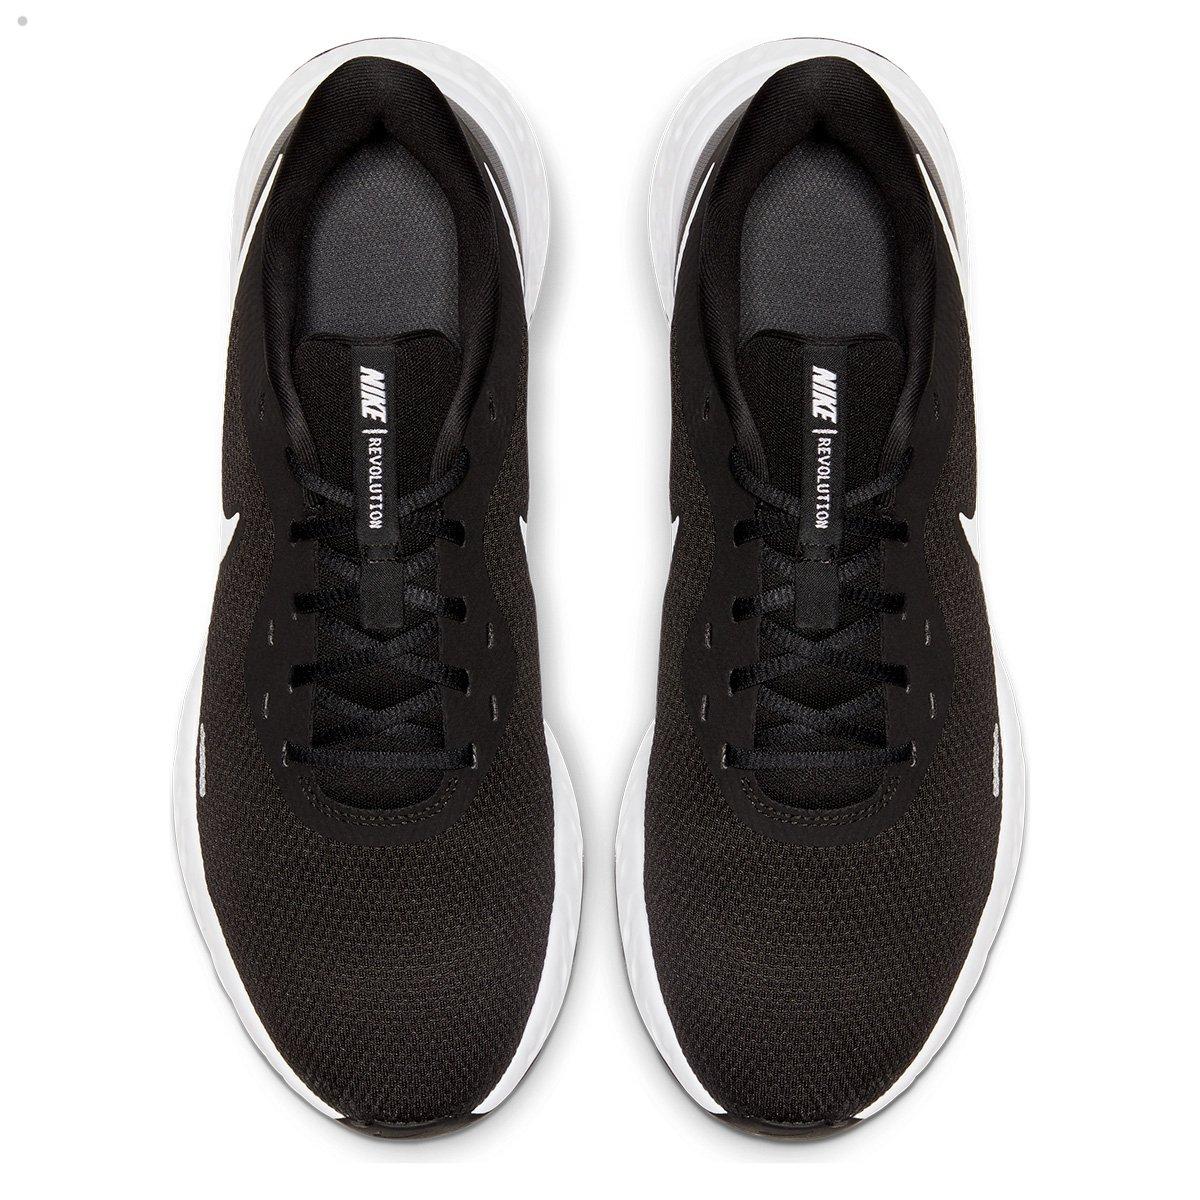 Tênis Nike Revolution 5 Masculino - Tam: 42 - 4